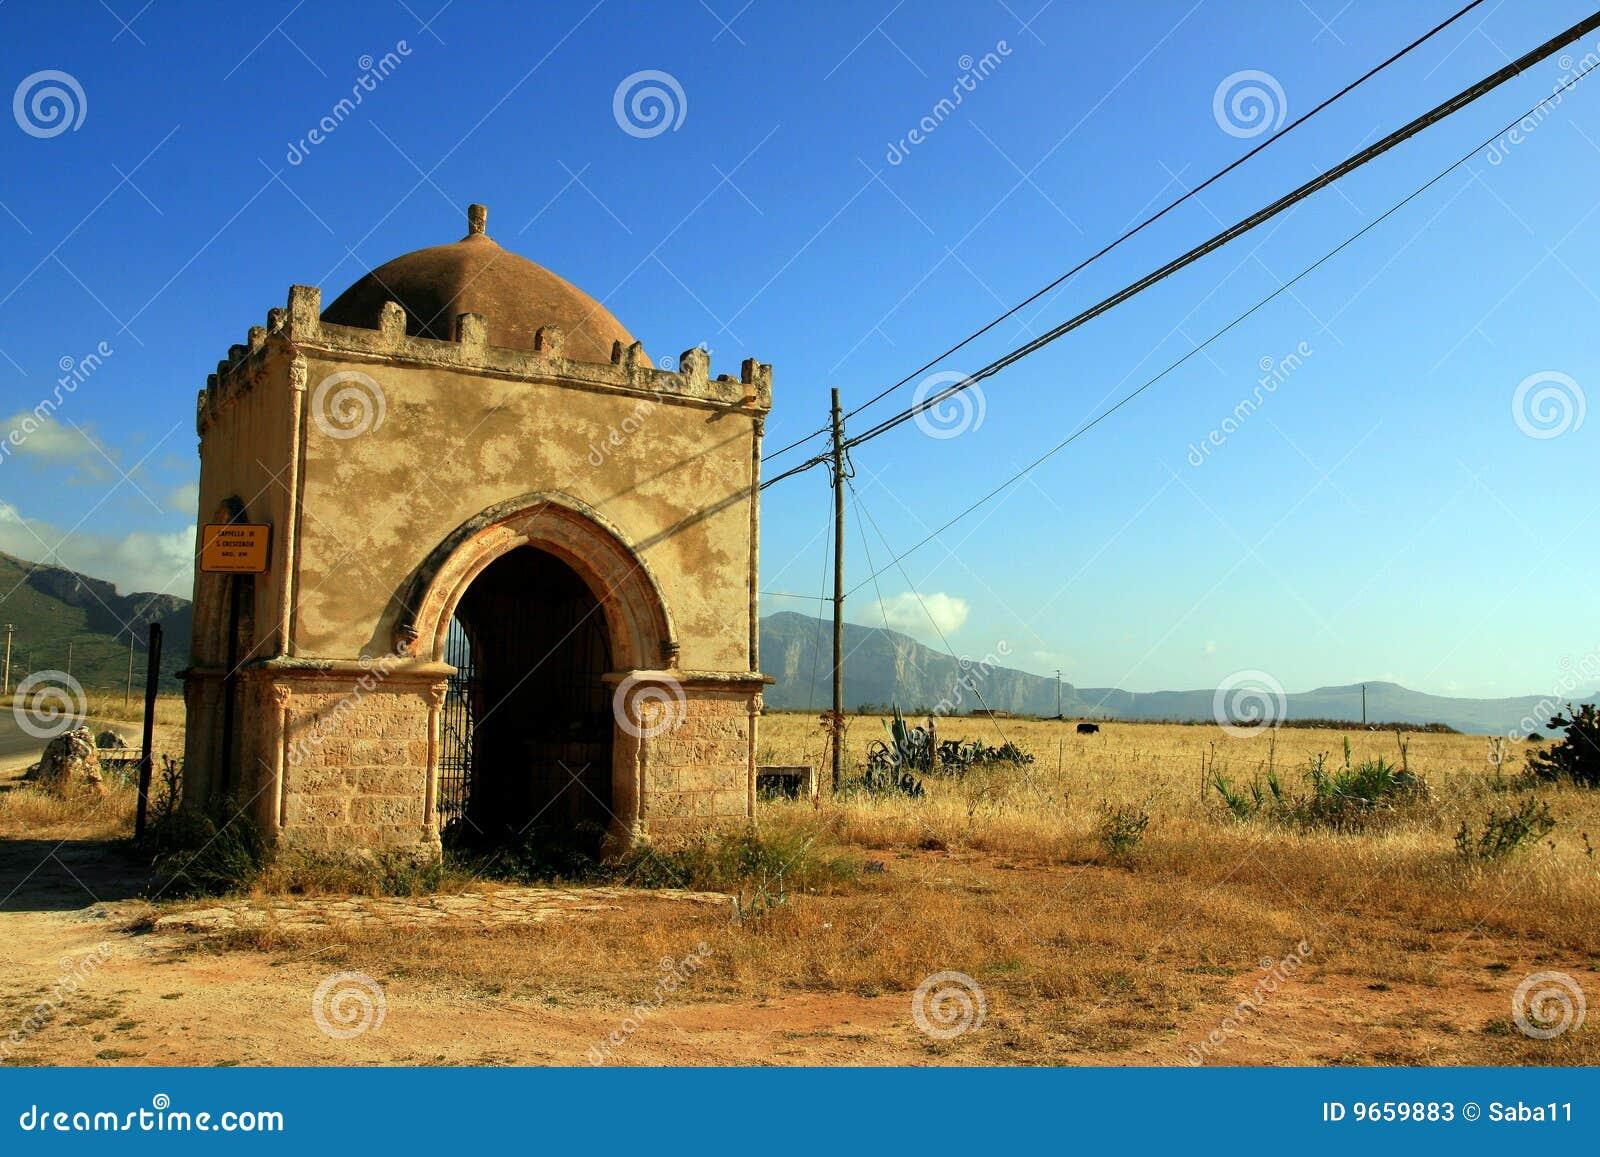 Oude landkapel in Sicilië. Italië